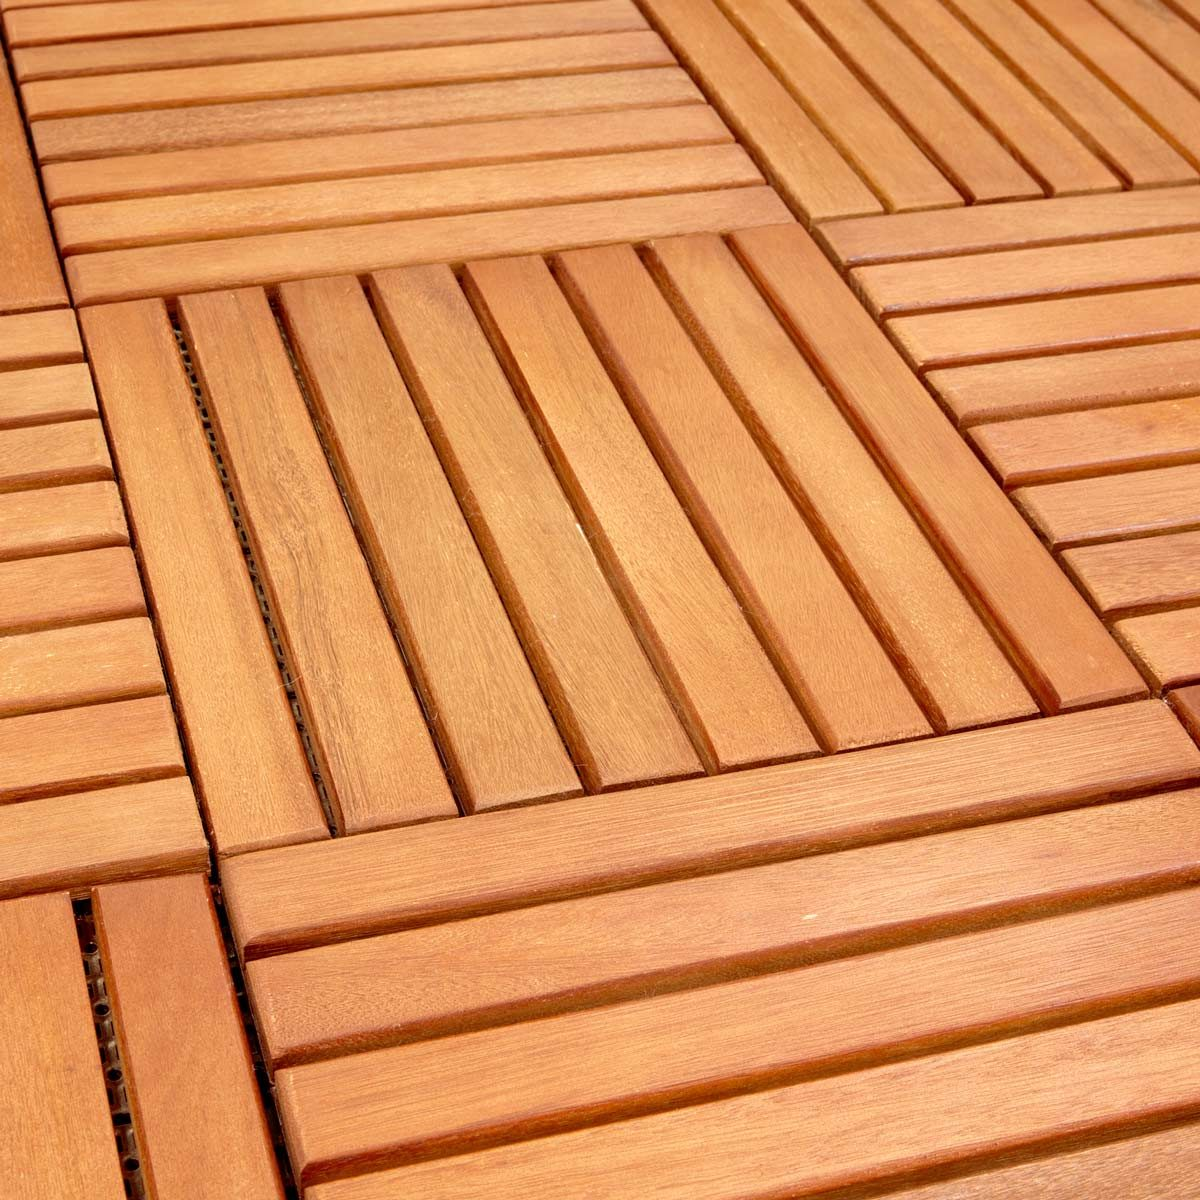 snap together wooden deck panels